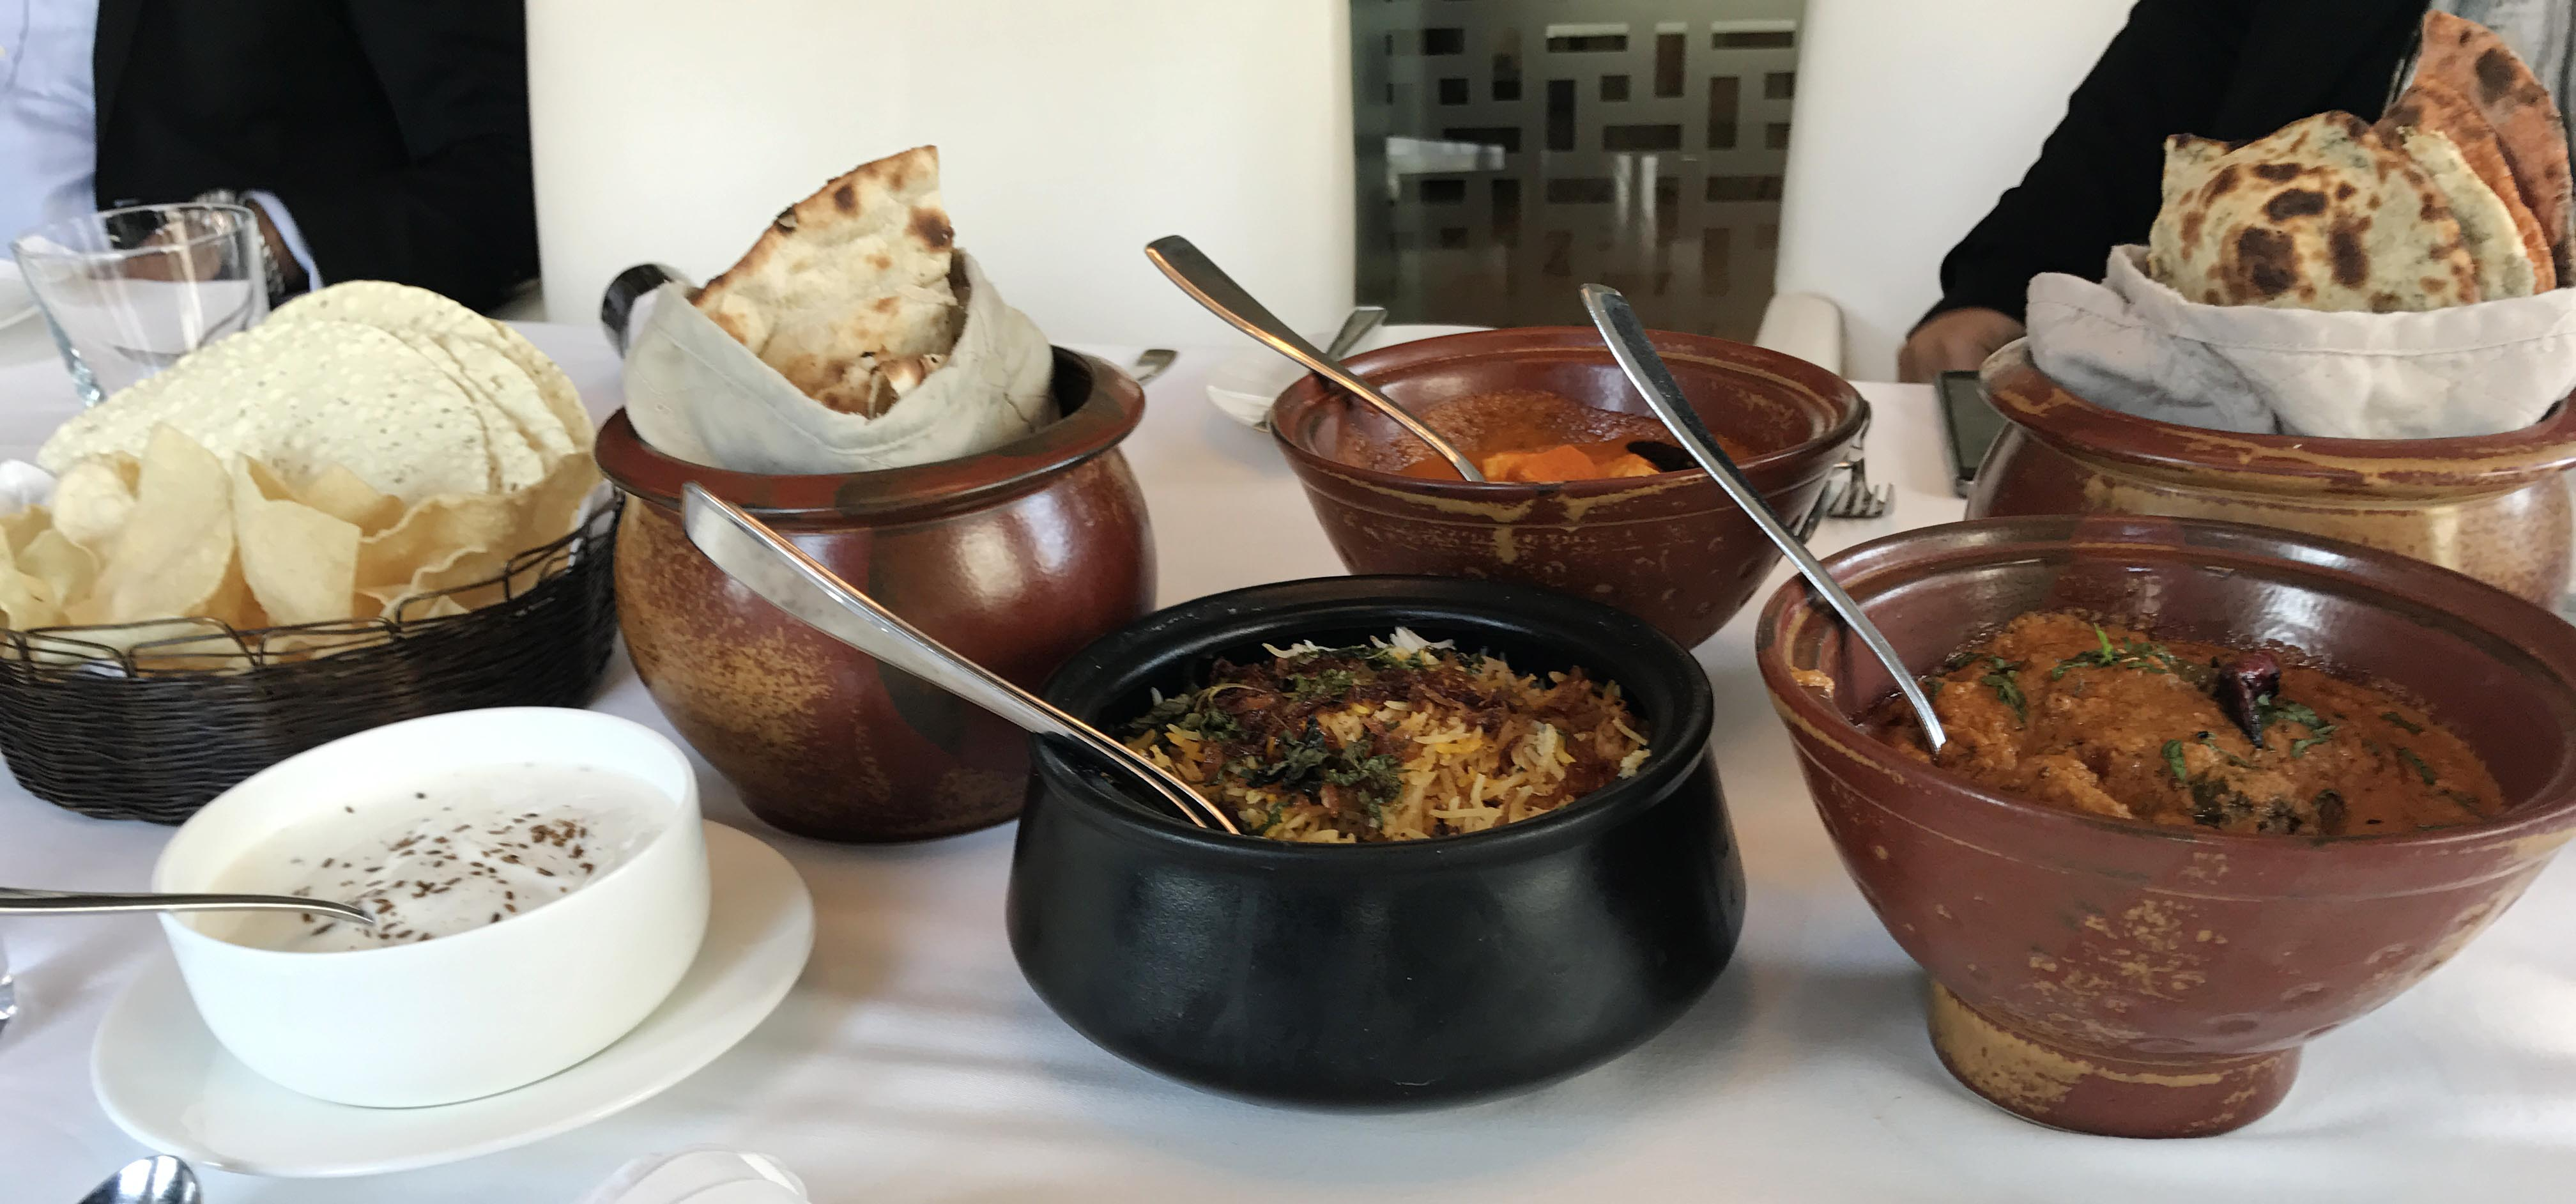 Our top 5 picks from Elan Lodhi's Hyderabadi Food Festival